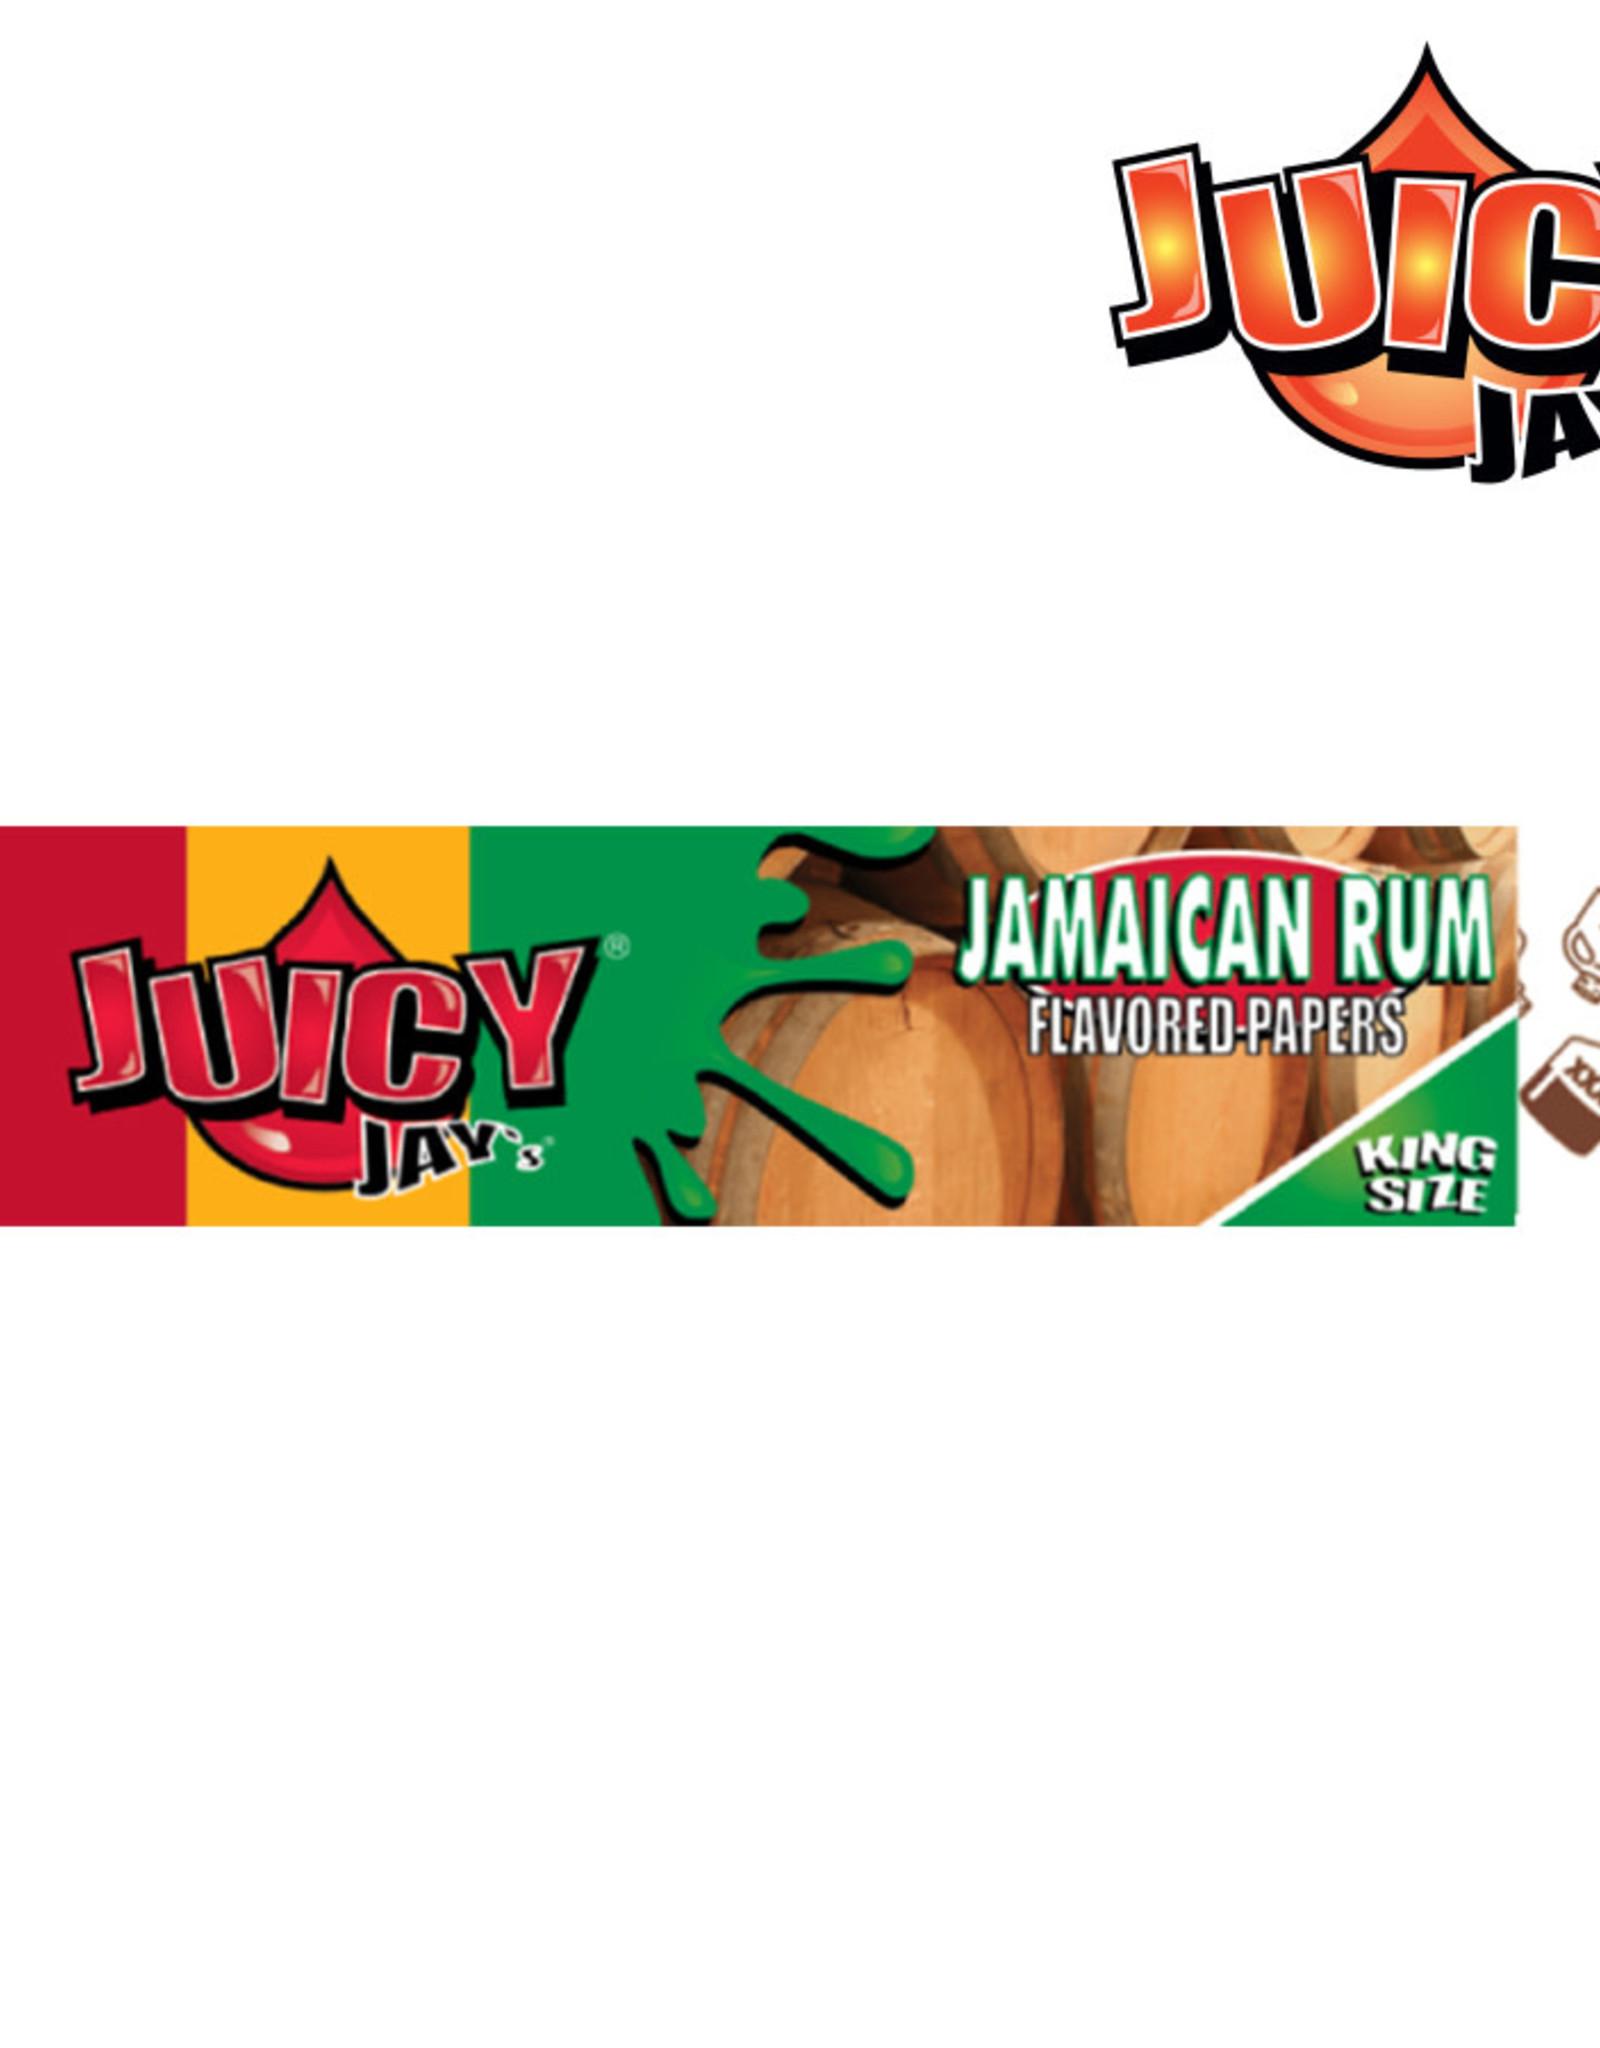 Juicy Jays's KingSize Jamaican Rum